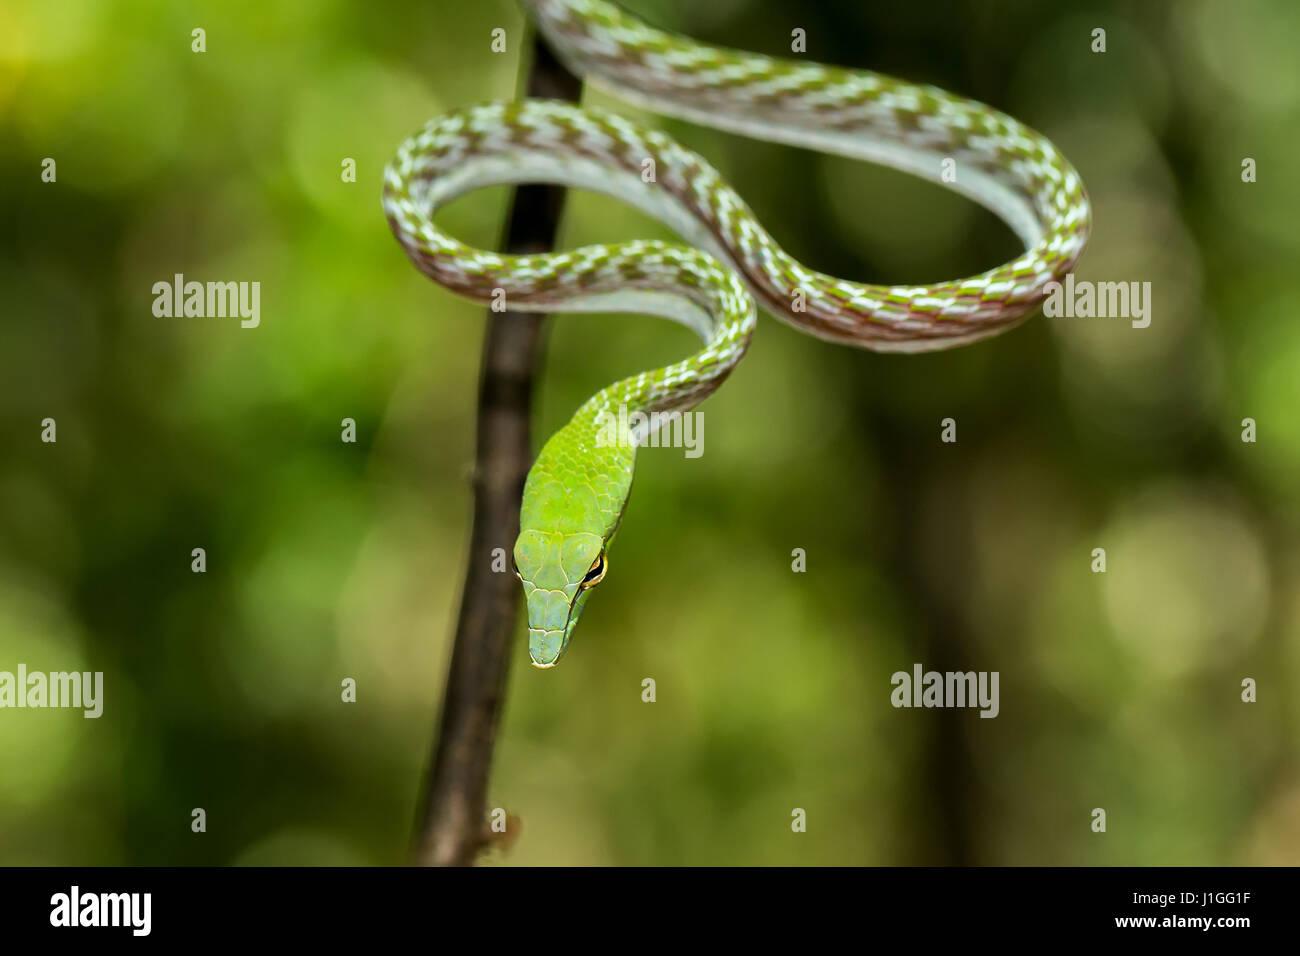 Oriental Whipsnake, asiatische Rebe grüne Schlange (Ahaetulla Prasina) Tangkoko Naturreservat in Nord-Sulawesi, Indonesien wildlife Stockfoto